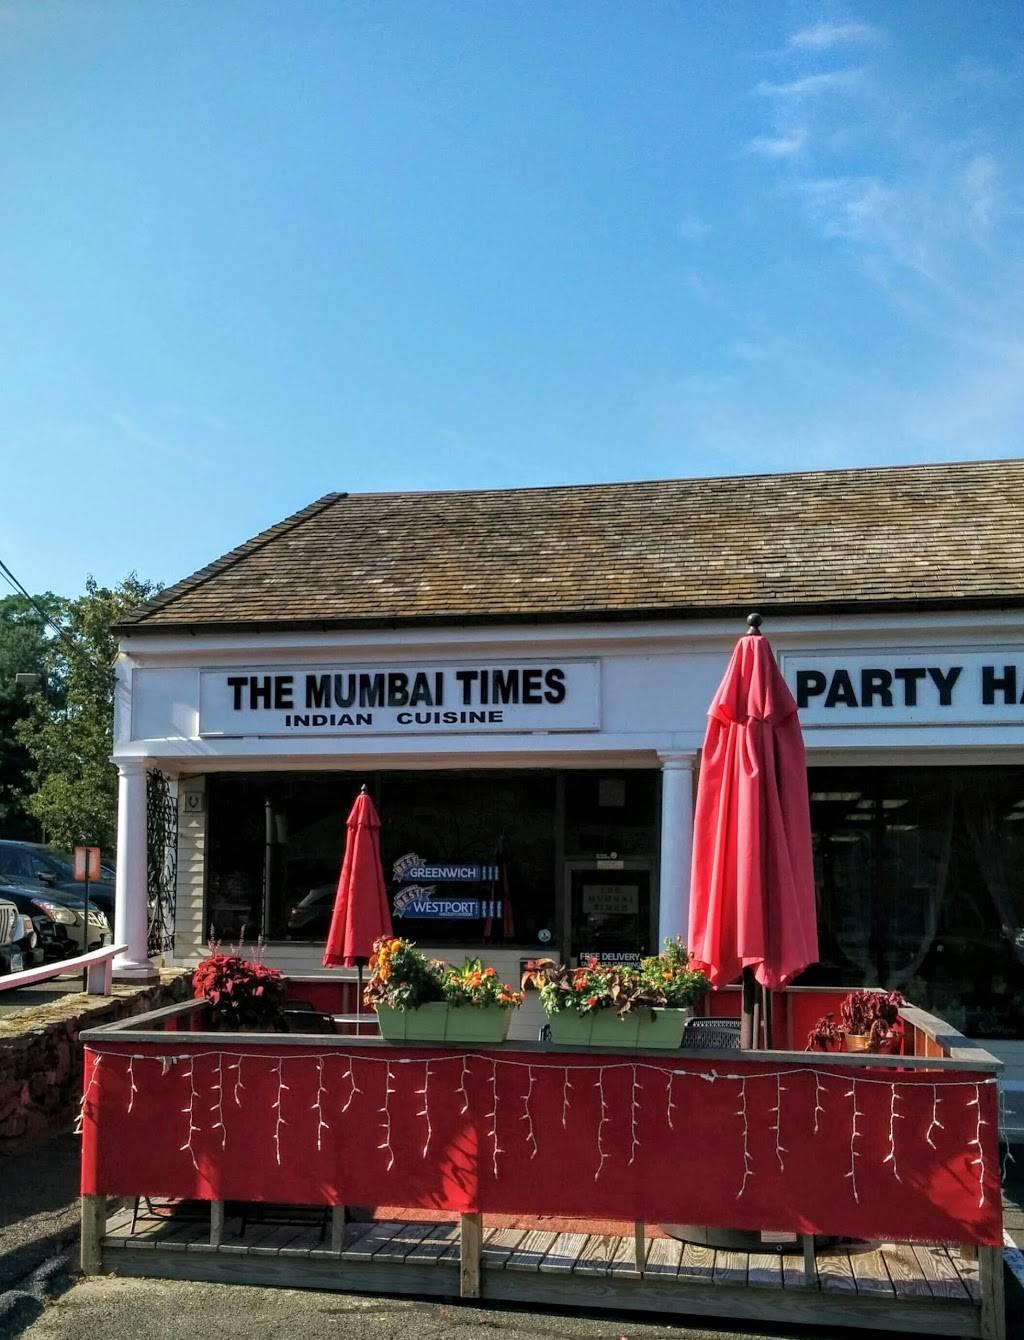 The Mumbai Times   restaurant   616 Post Rd E, Westport, CT 06880, USA   2032260211 OR +1 203-226-0211